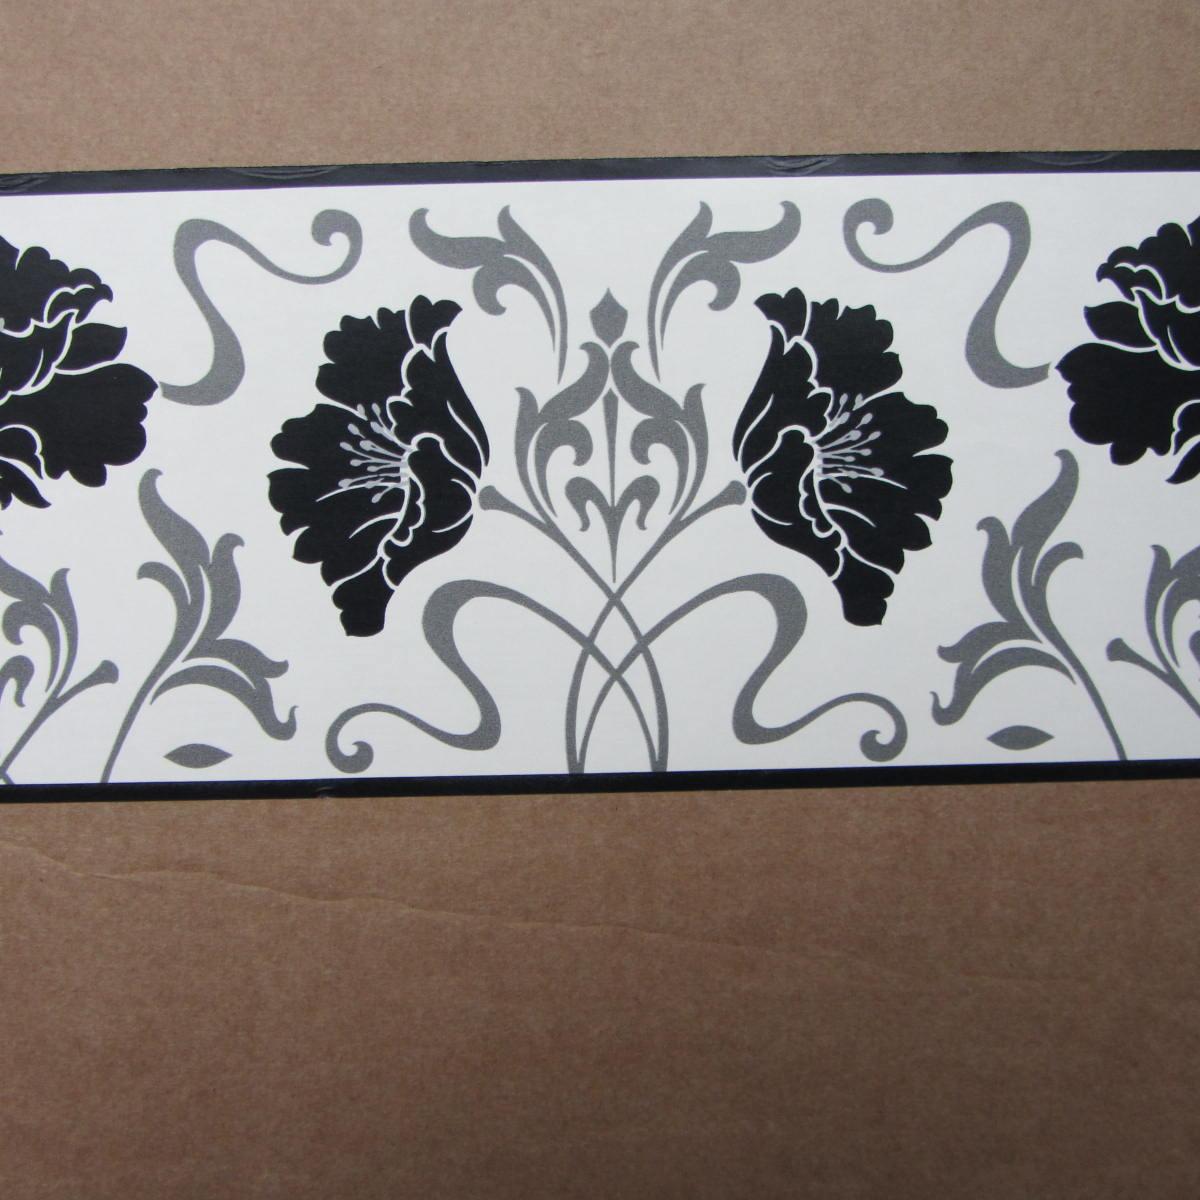 Floral Damask Black White Wallpaper Border Self Adhesive - Modern Grey Wallpaper Border , HD Wallpaper & Backgrounds